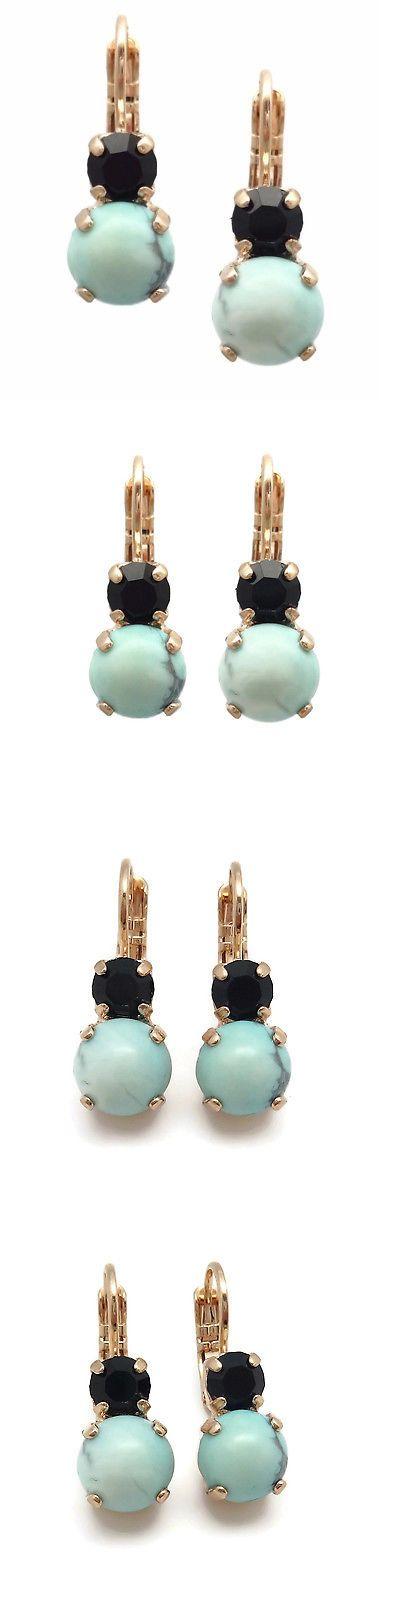 Earrings Mariana Swarovski Crystal Rose Gold Earrings